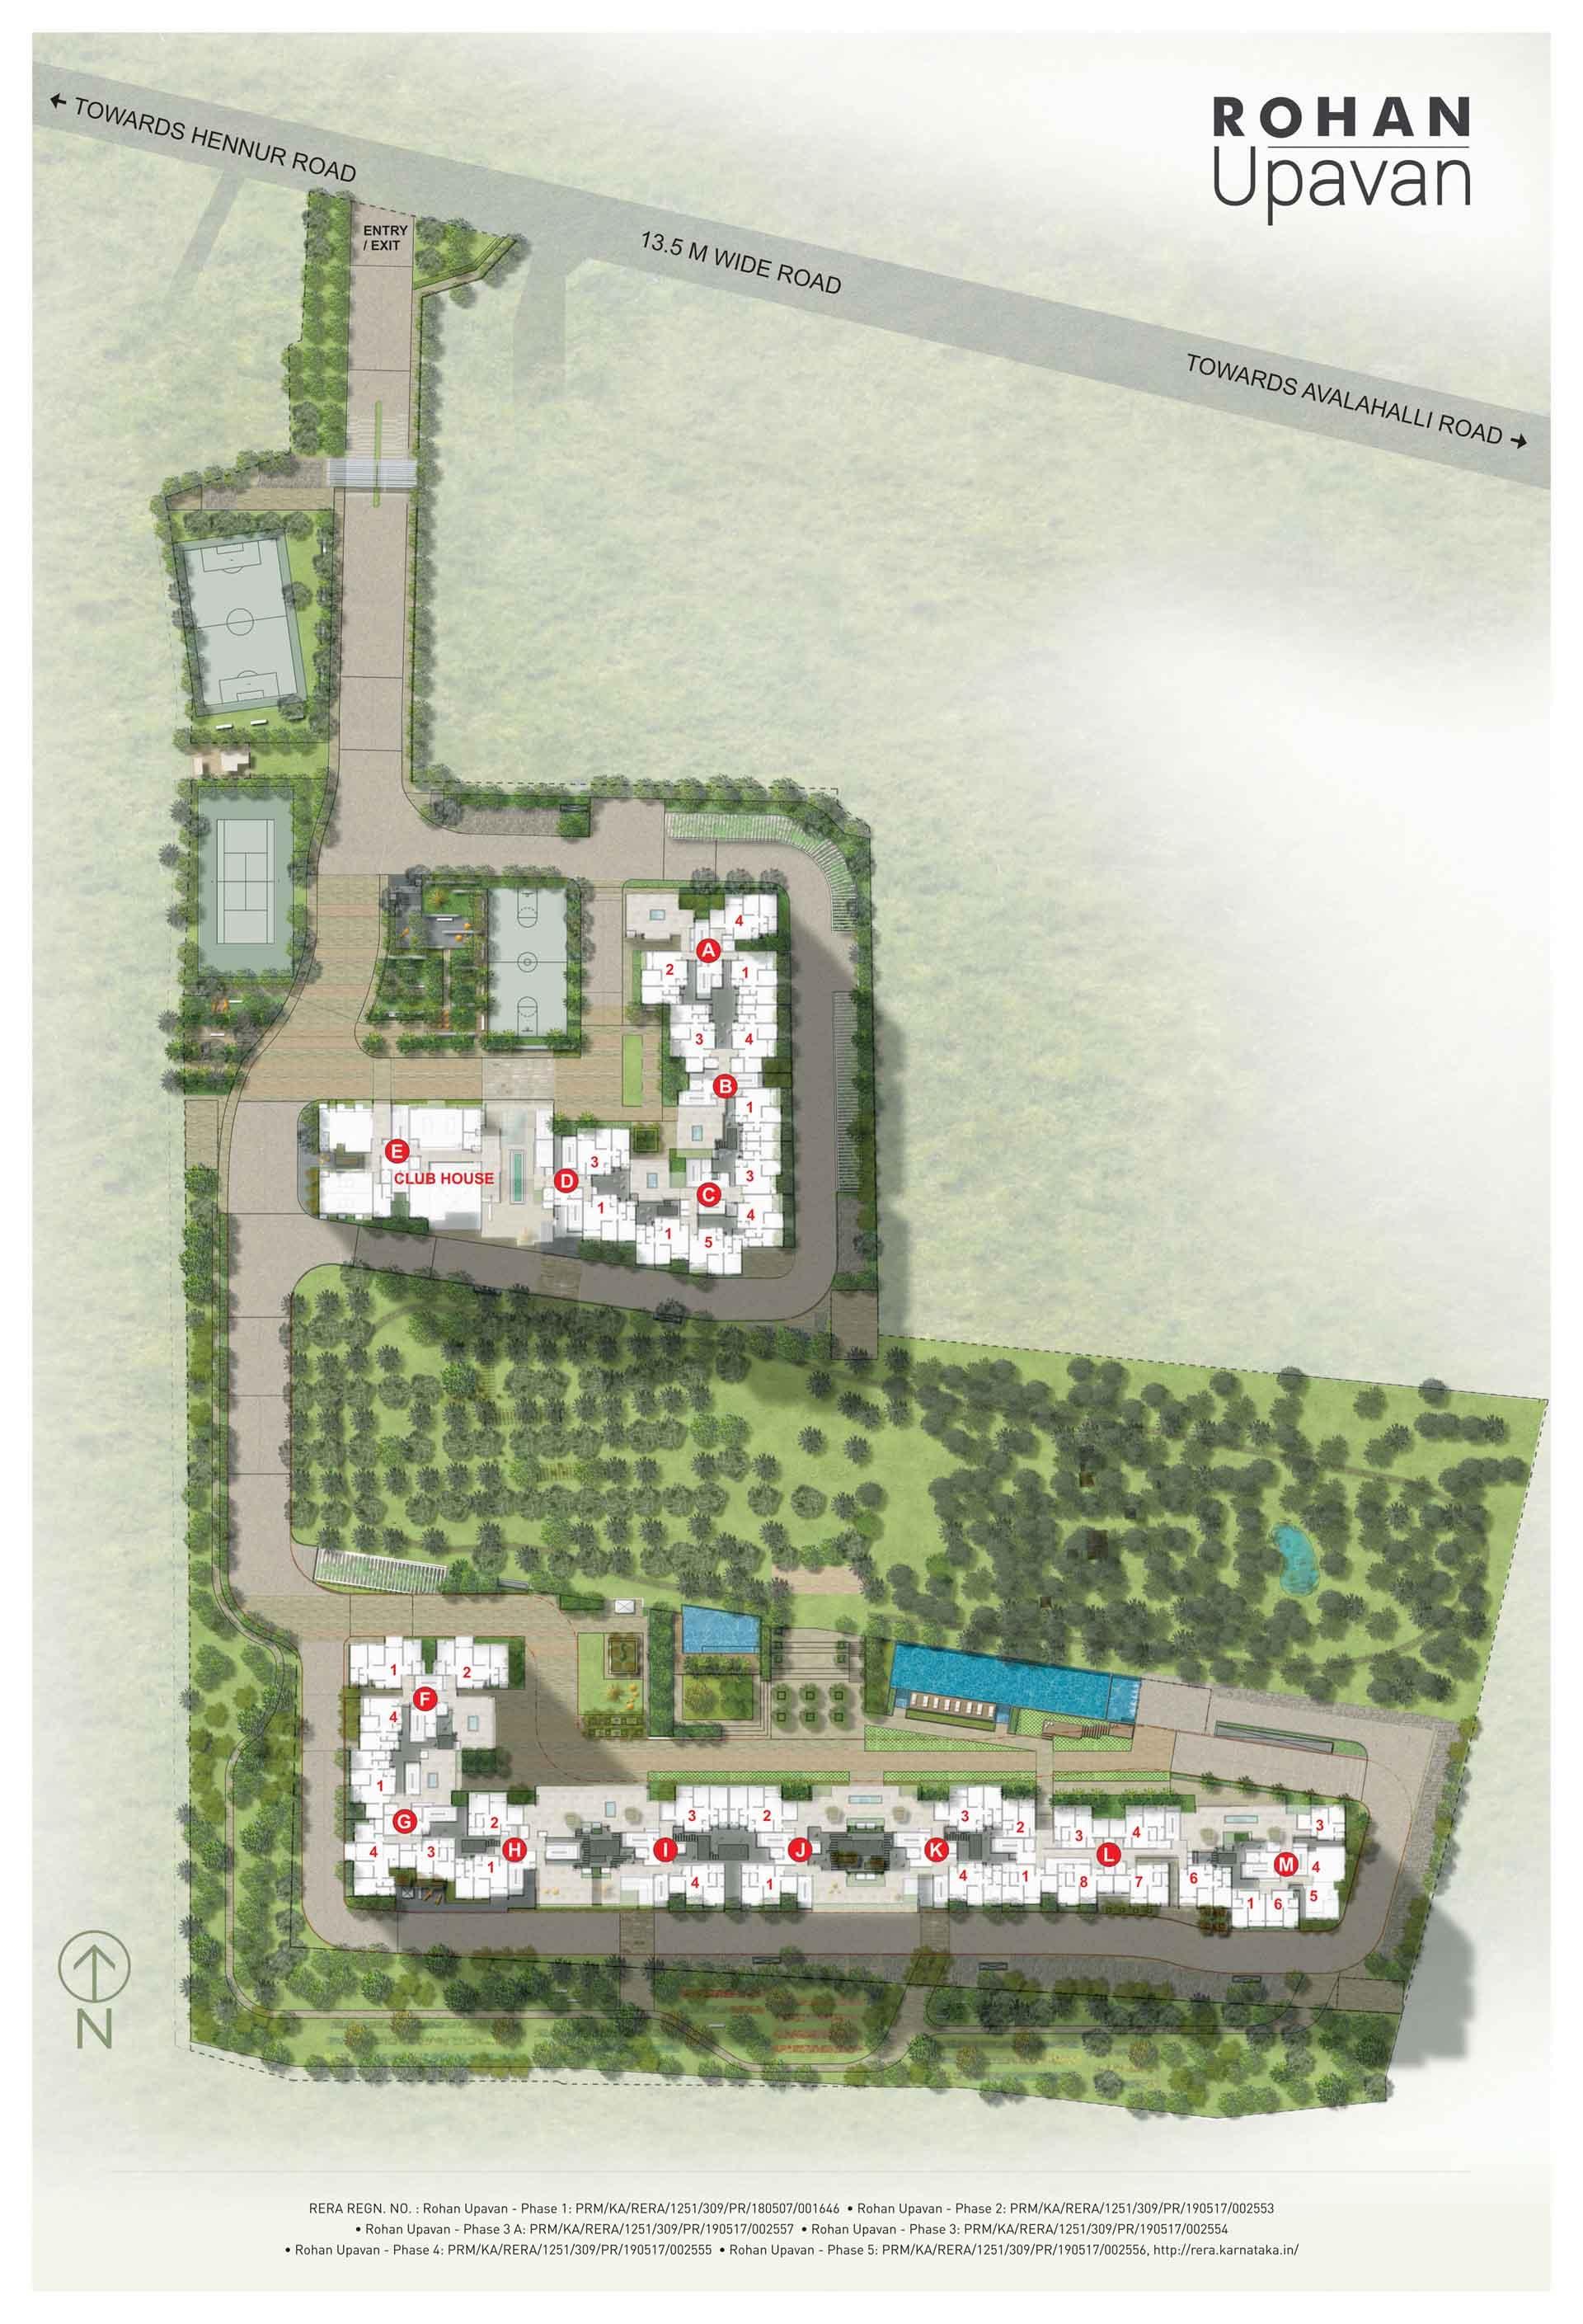 rohan upavan phase iv project master plan image1